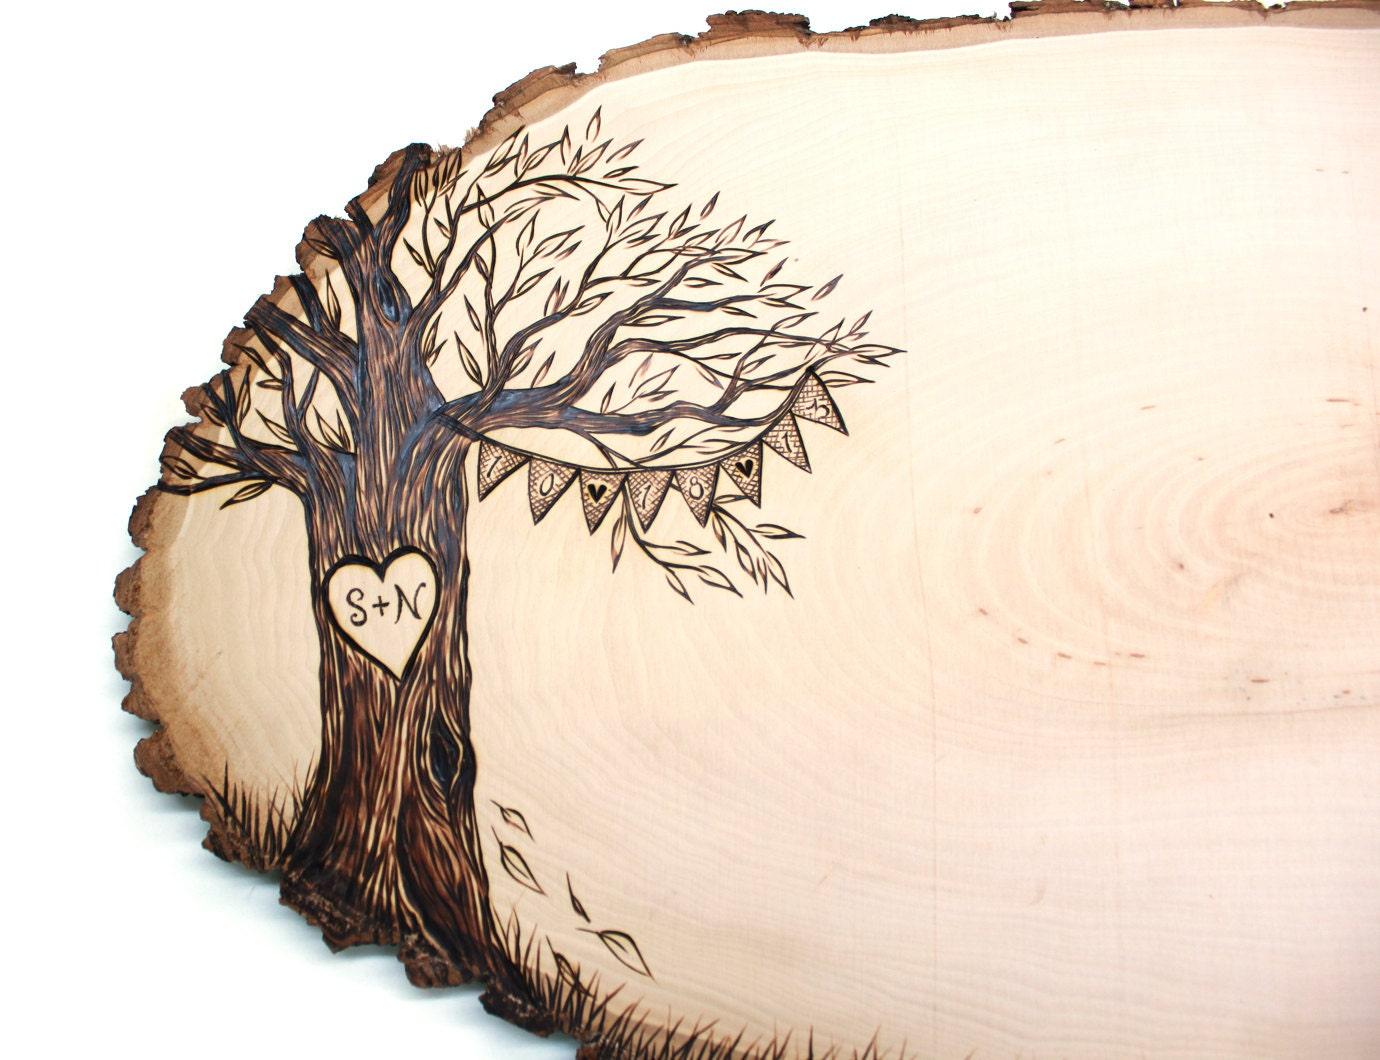 Burlap Banner Design: Wood slice rustic theme wedding guest